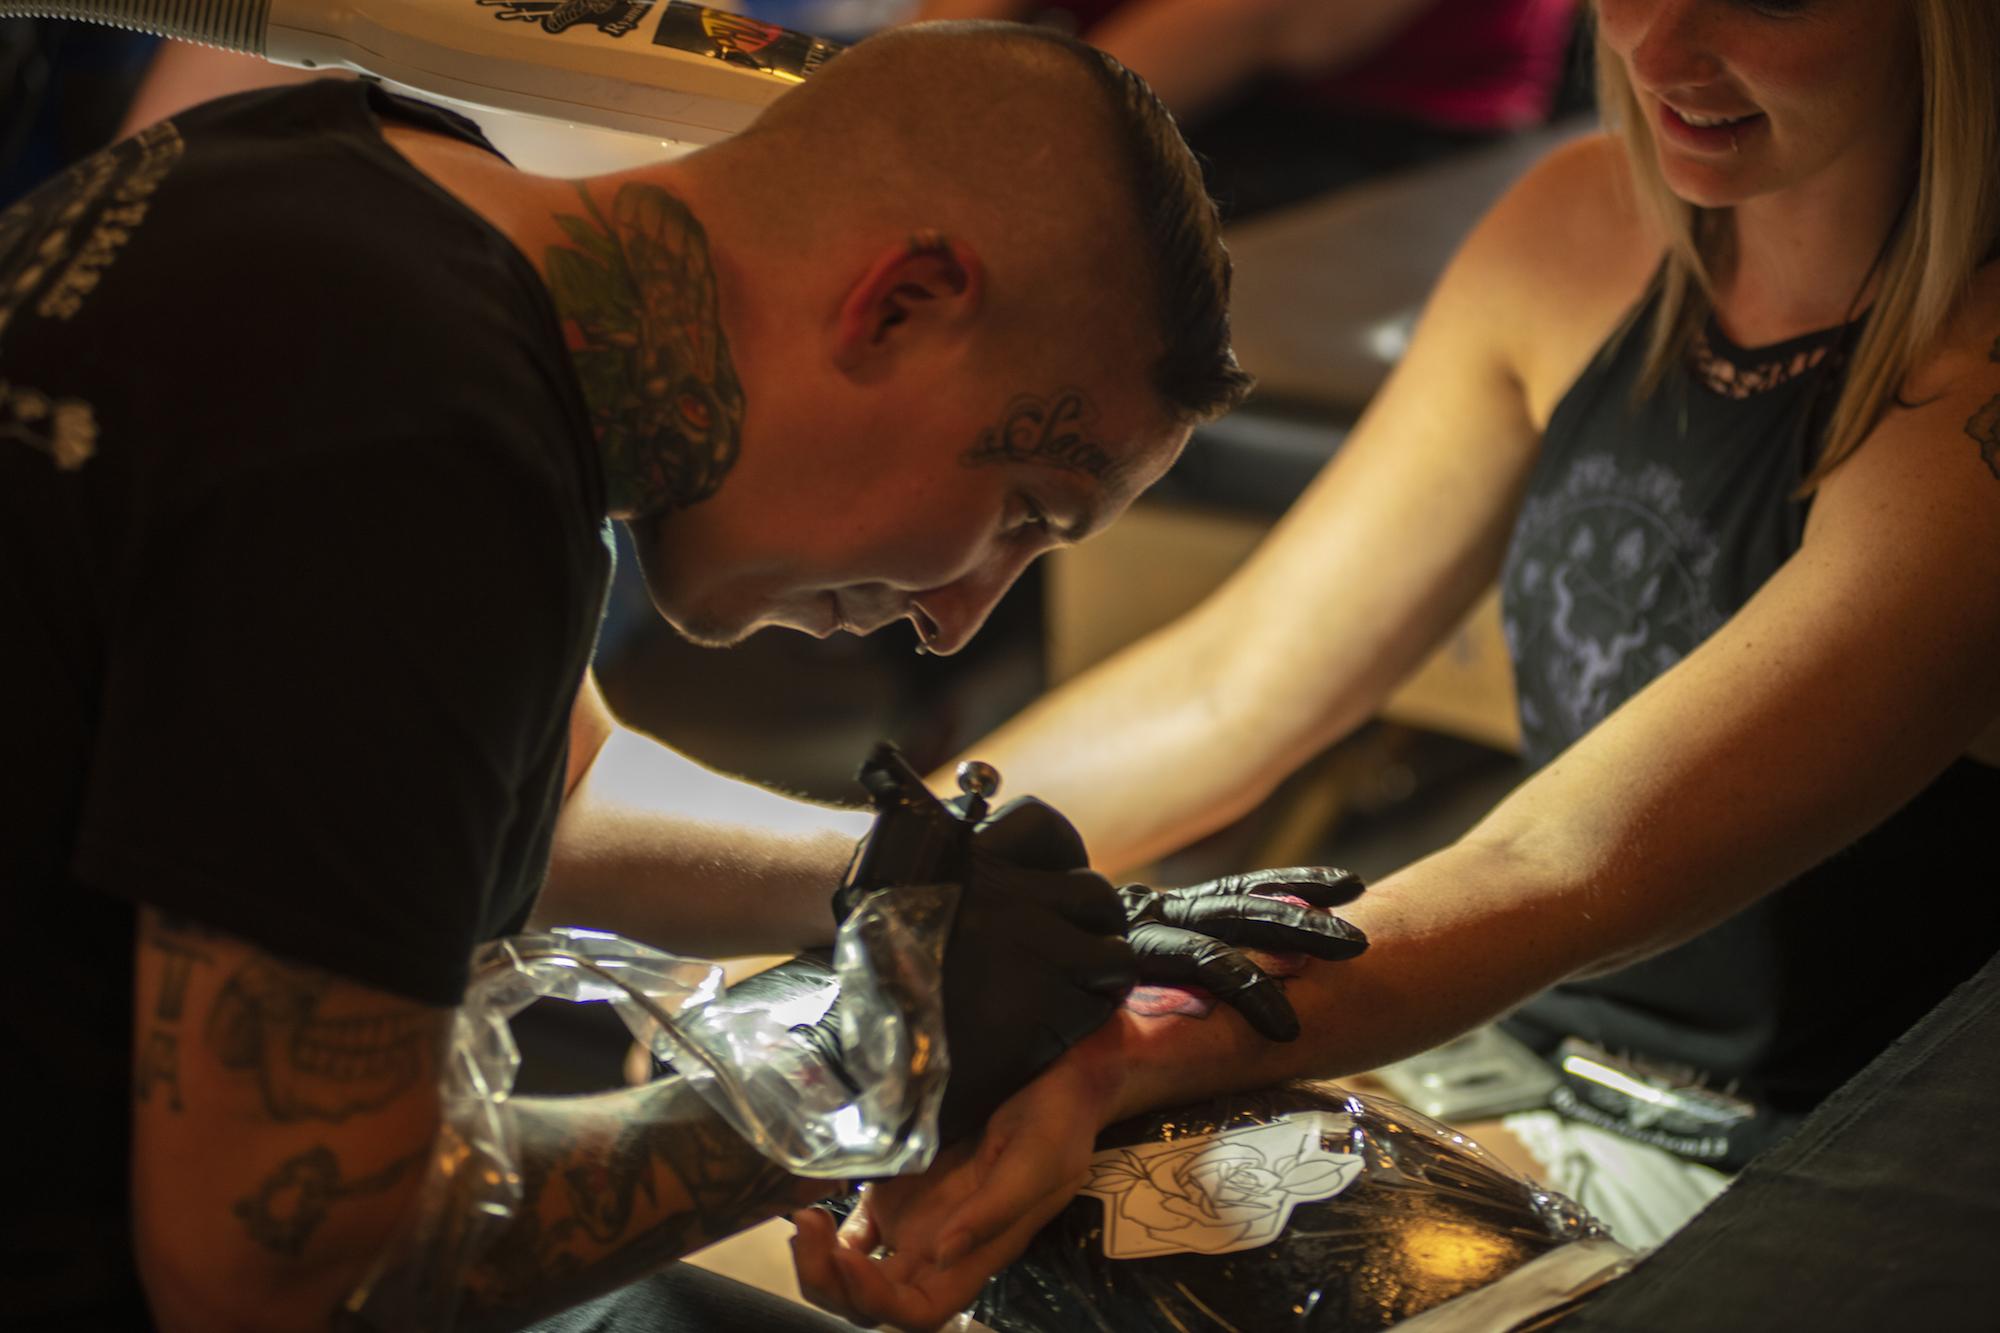 Tattoos-5873.jpg